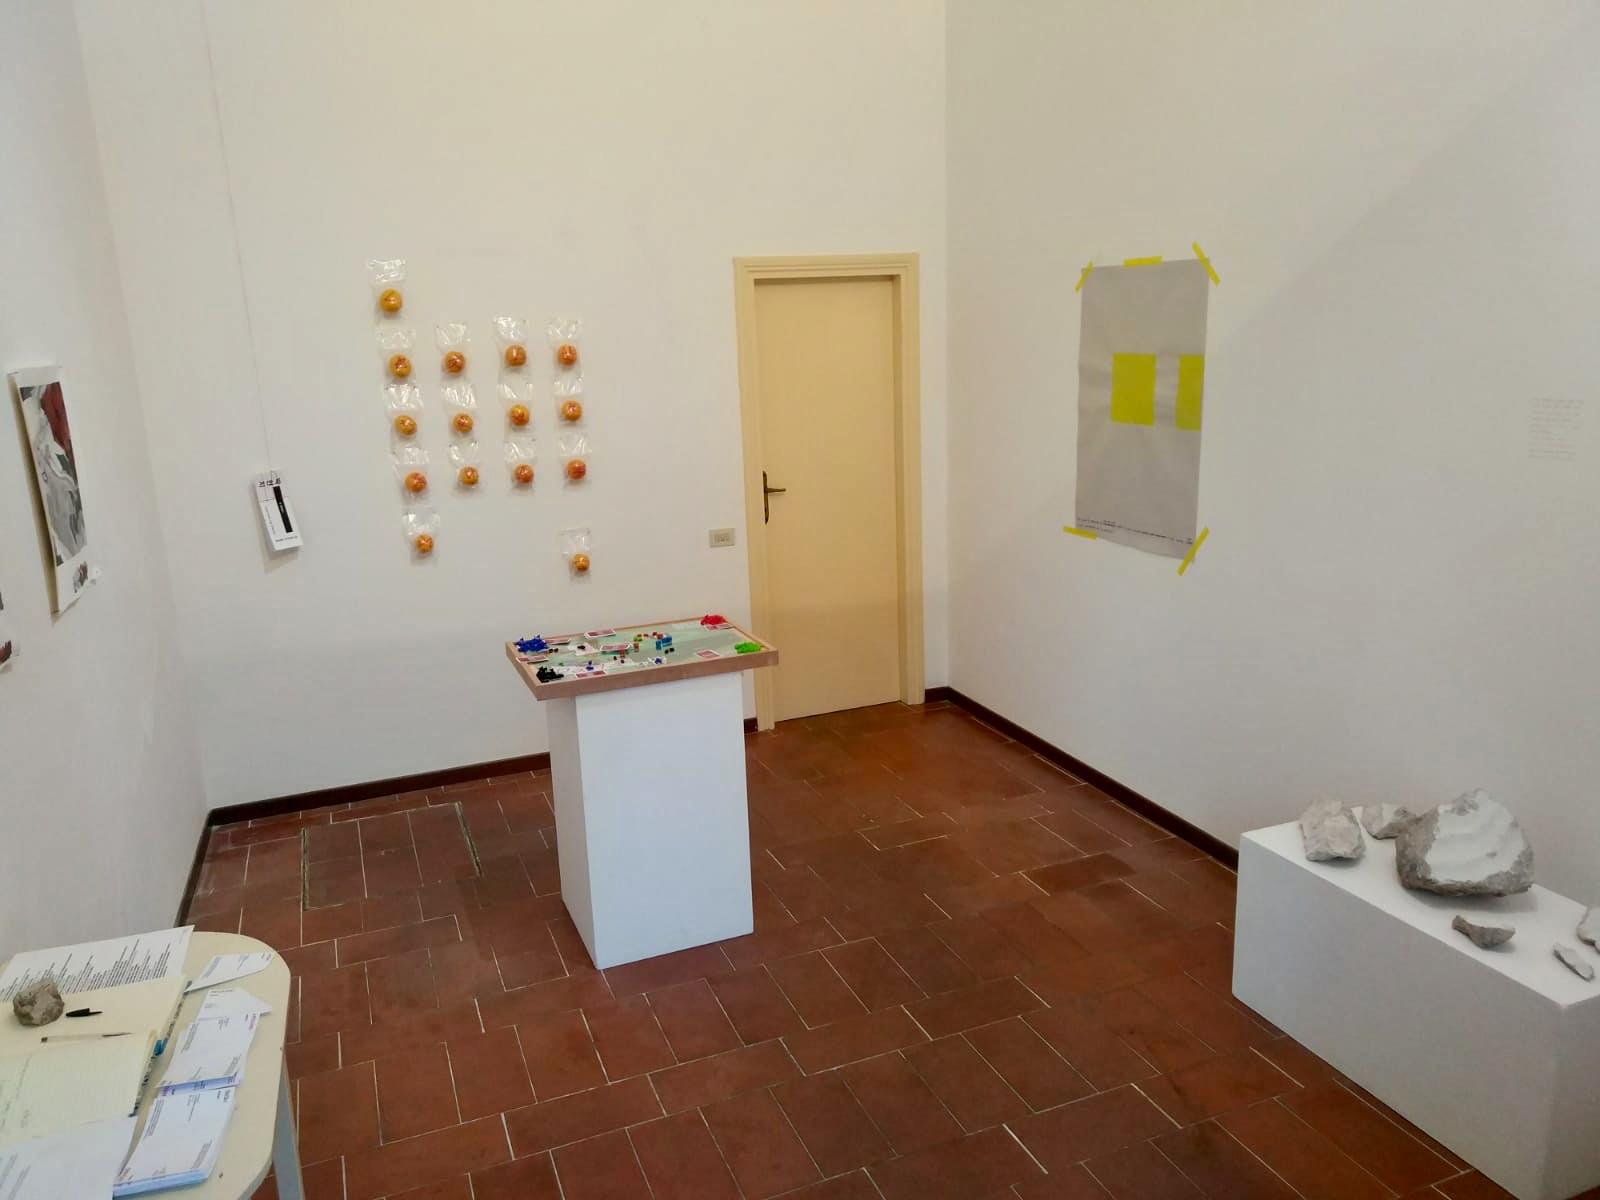 Exhibition view: Paloma Mecozzi, Park Hyun Gi, GB Group, Nicola Guastamacchia, Miguel Sbastida